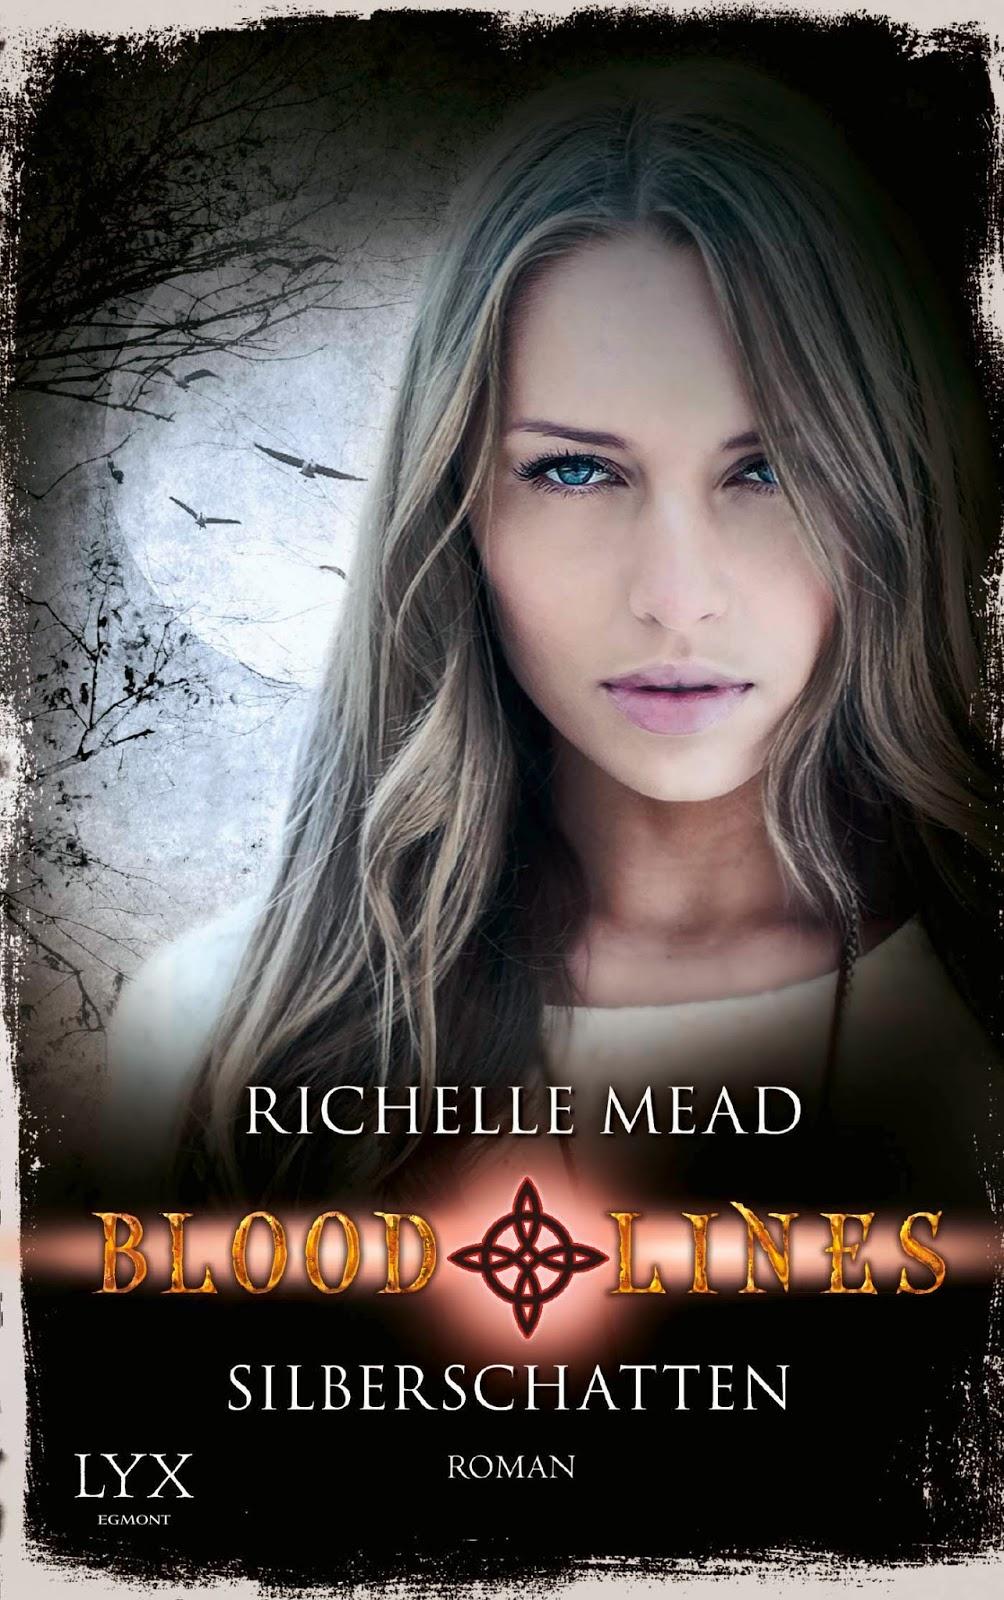 Mead, Richelle ∞ Bloodlines: Silberschatten